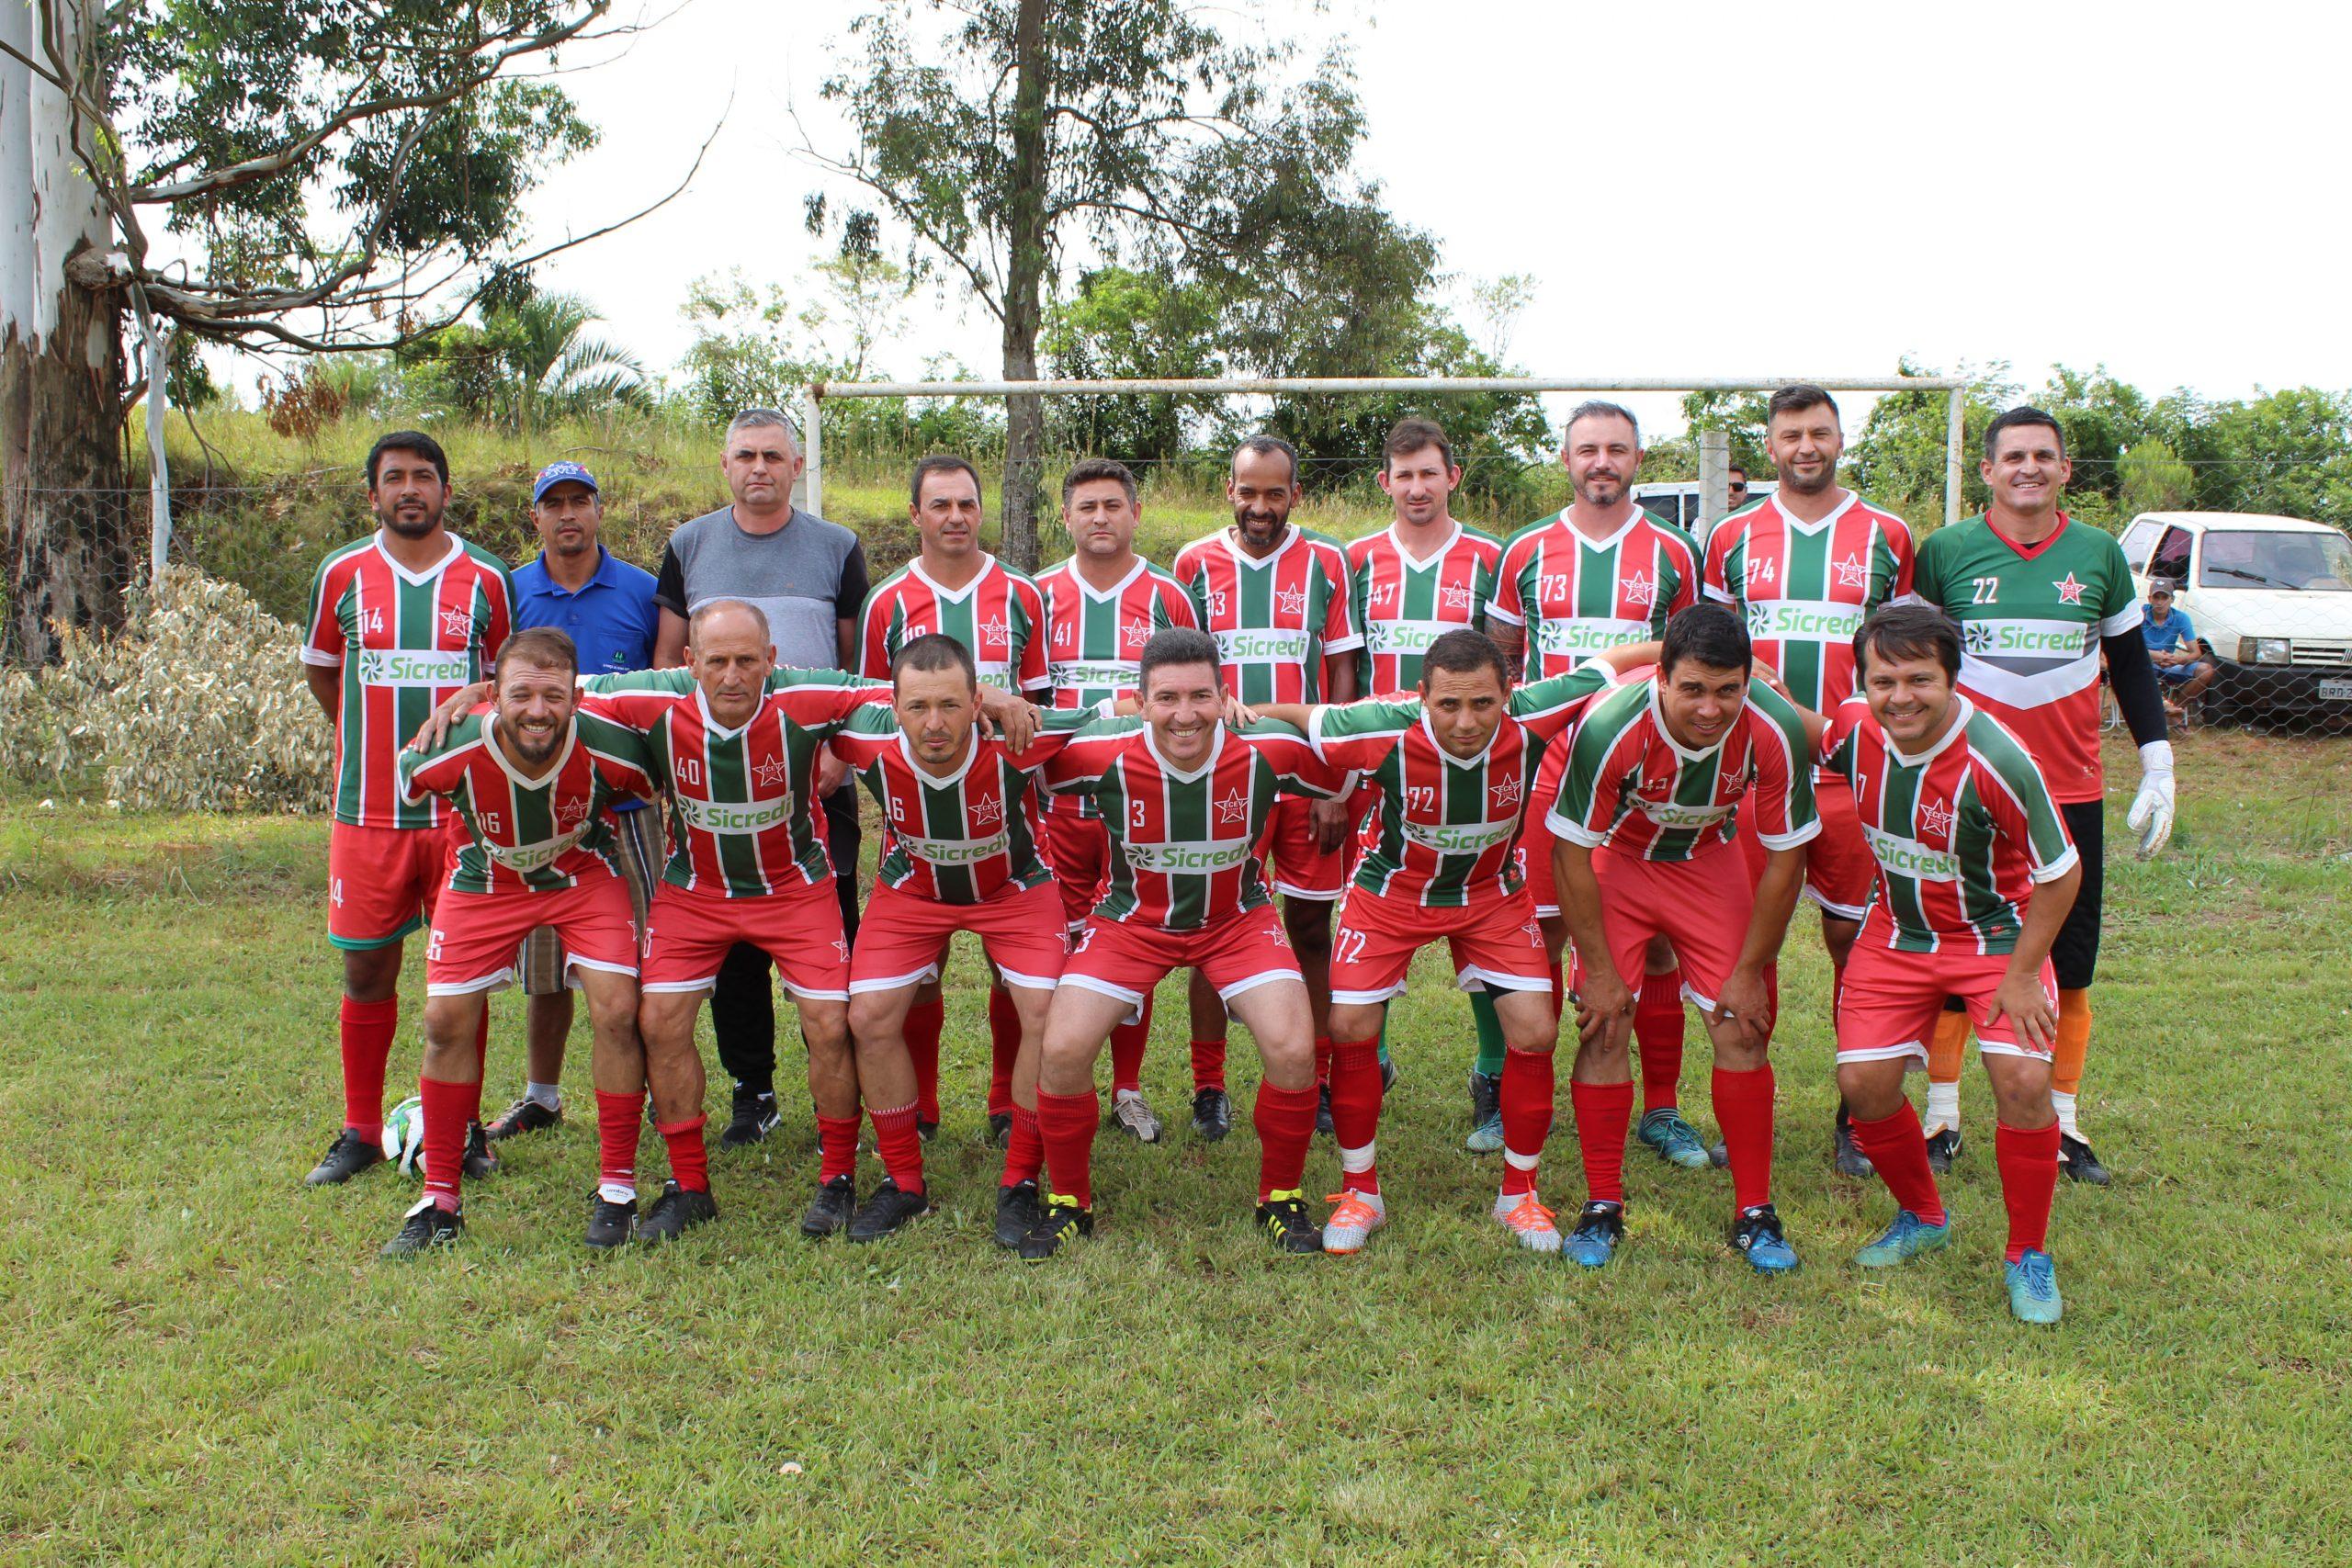 Campeonato de Tio Hugo: Mormaço finalista no veterano e EC Divino do principal